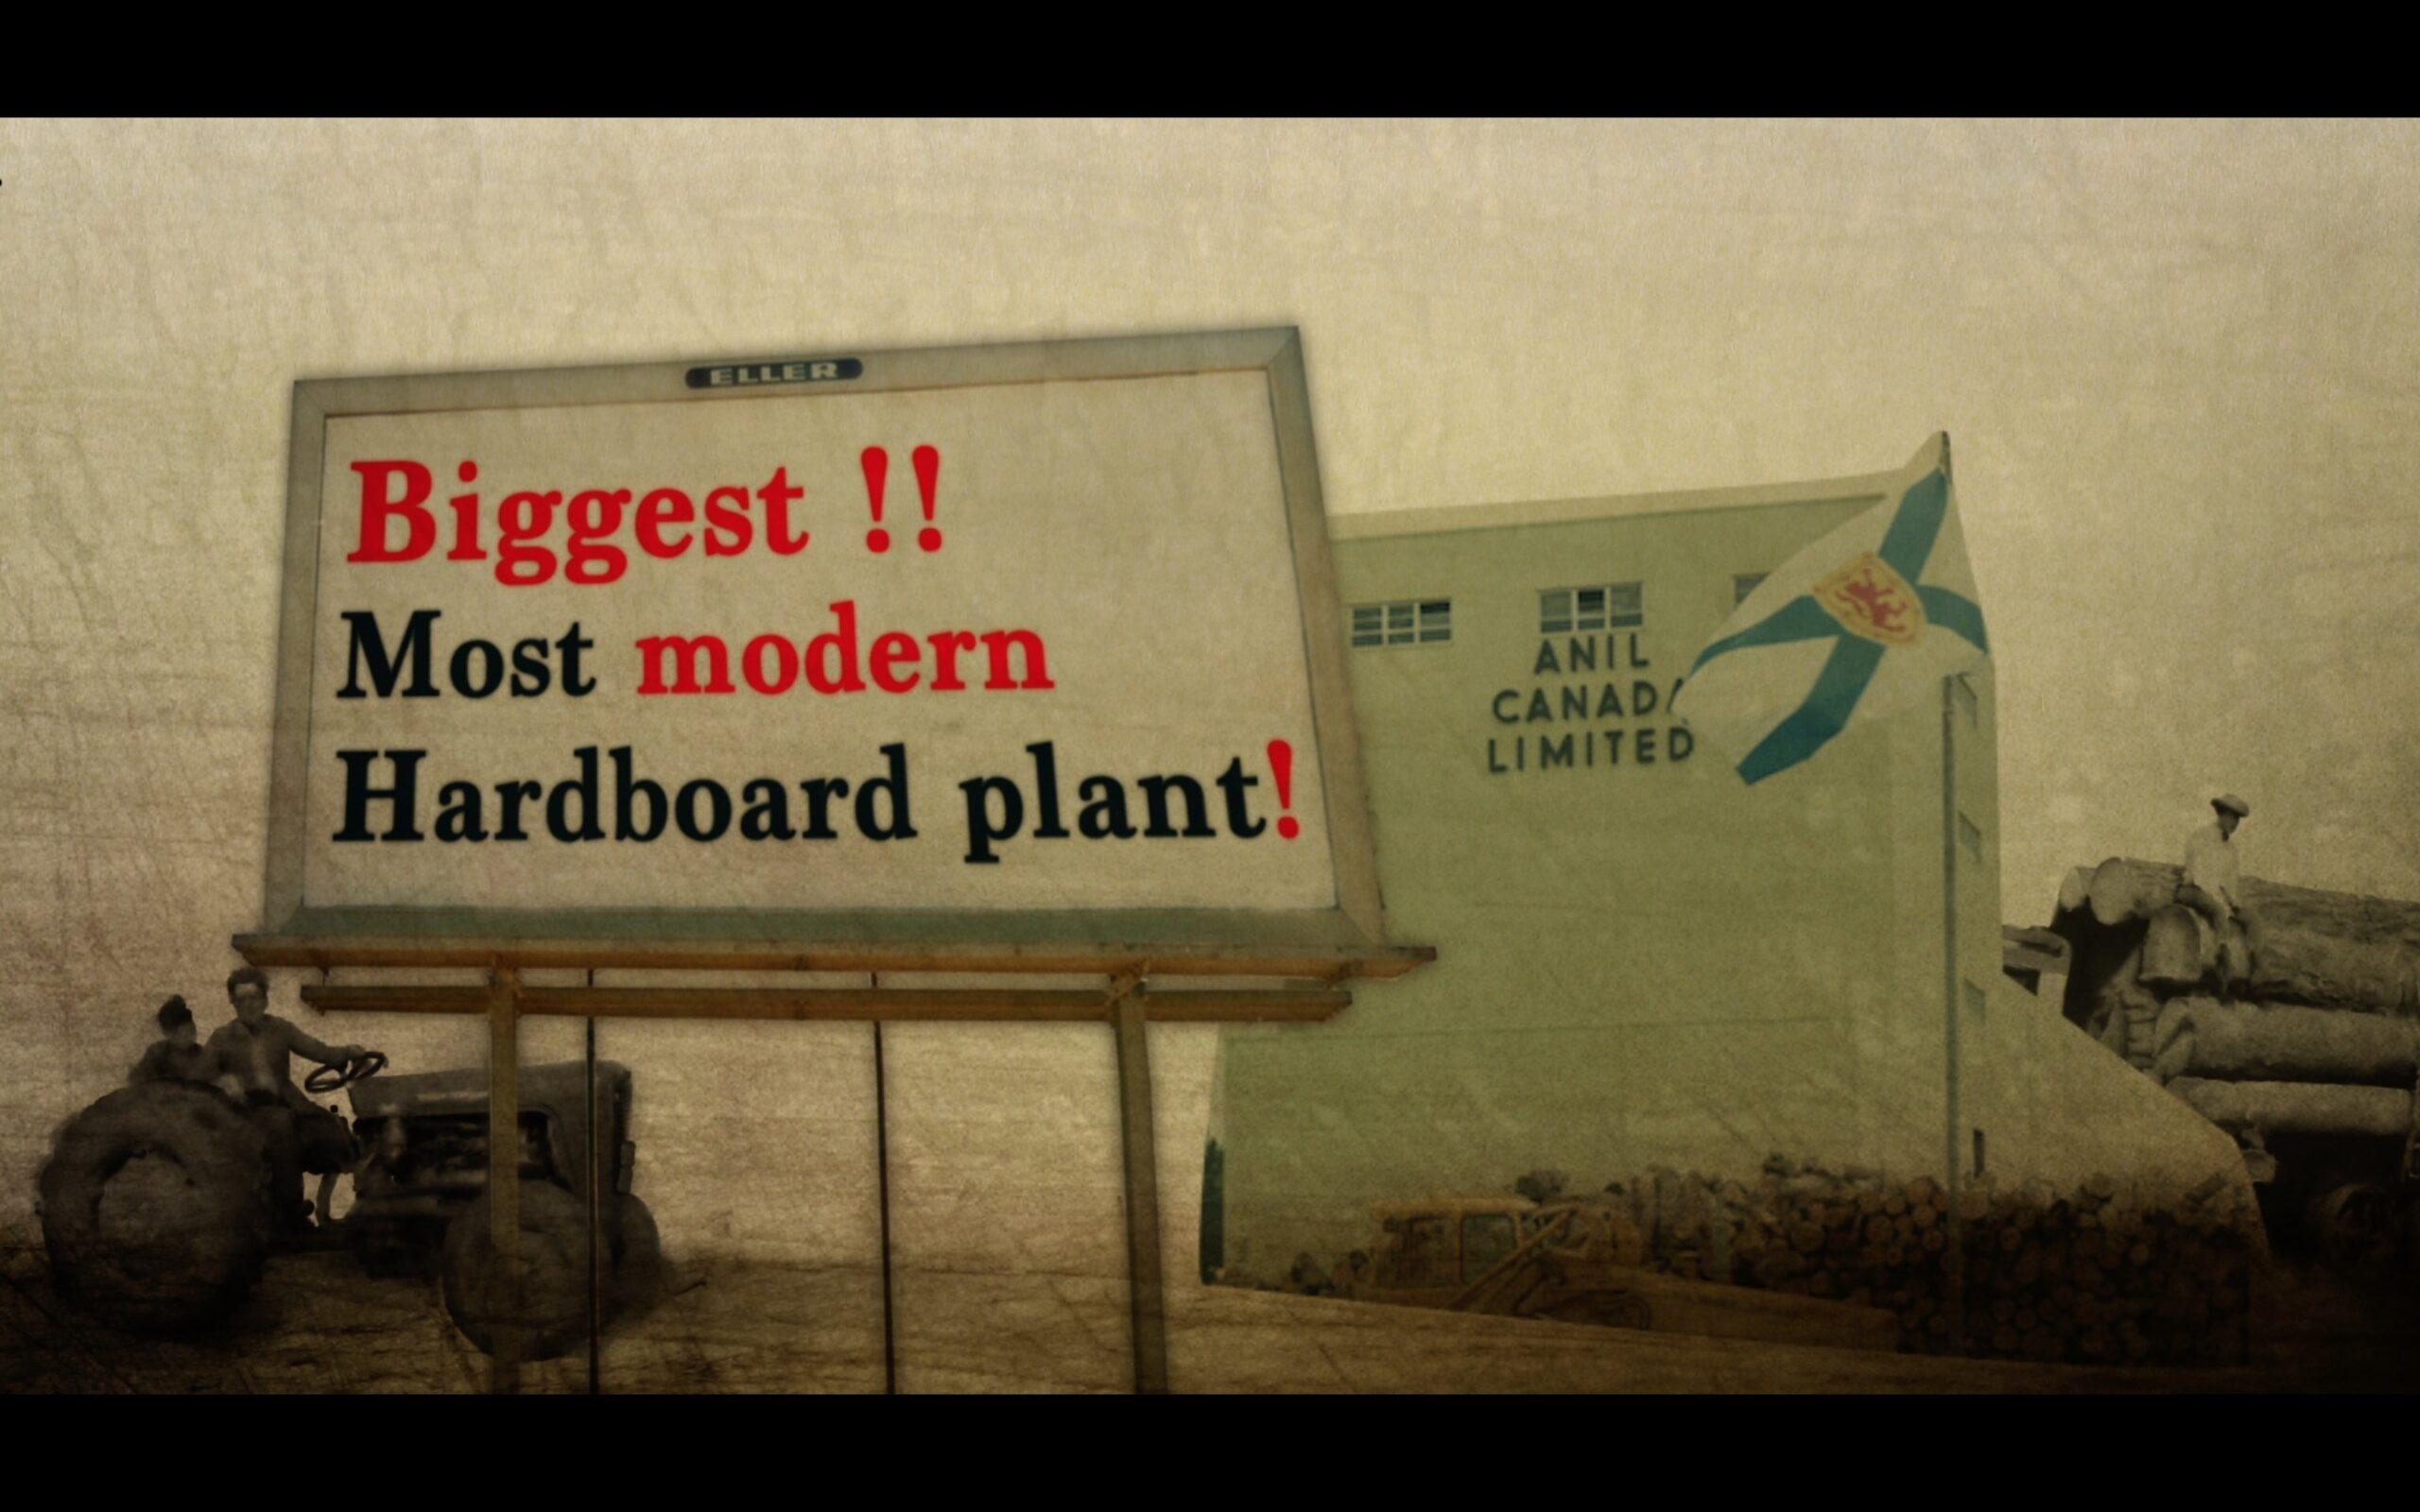 Sign saying Biggest!! Most modern hardboard plant!